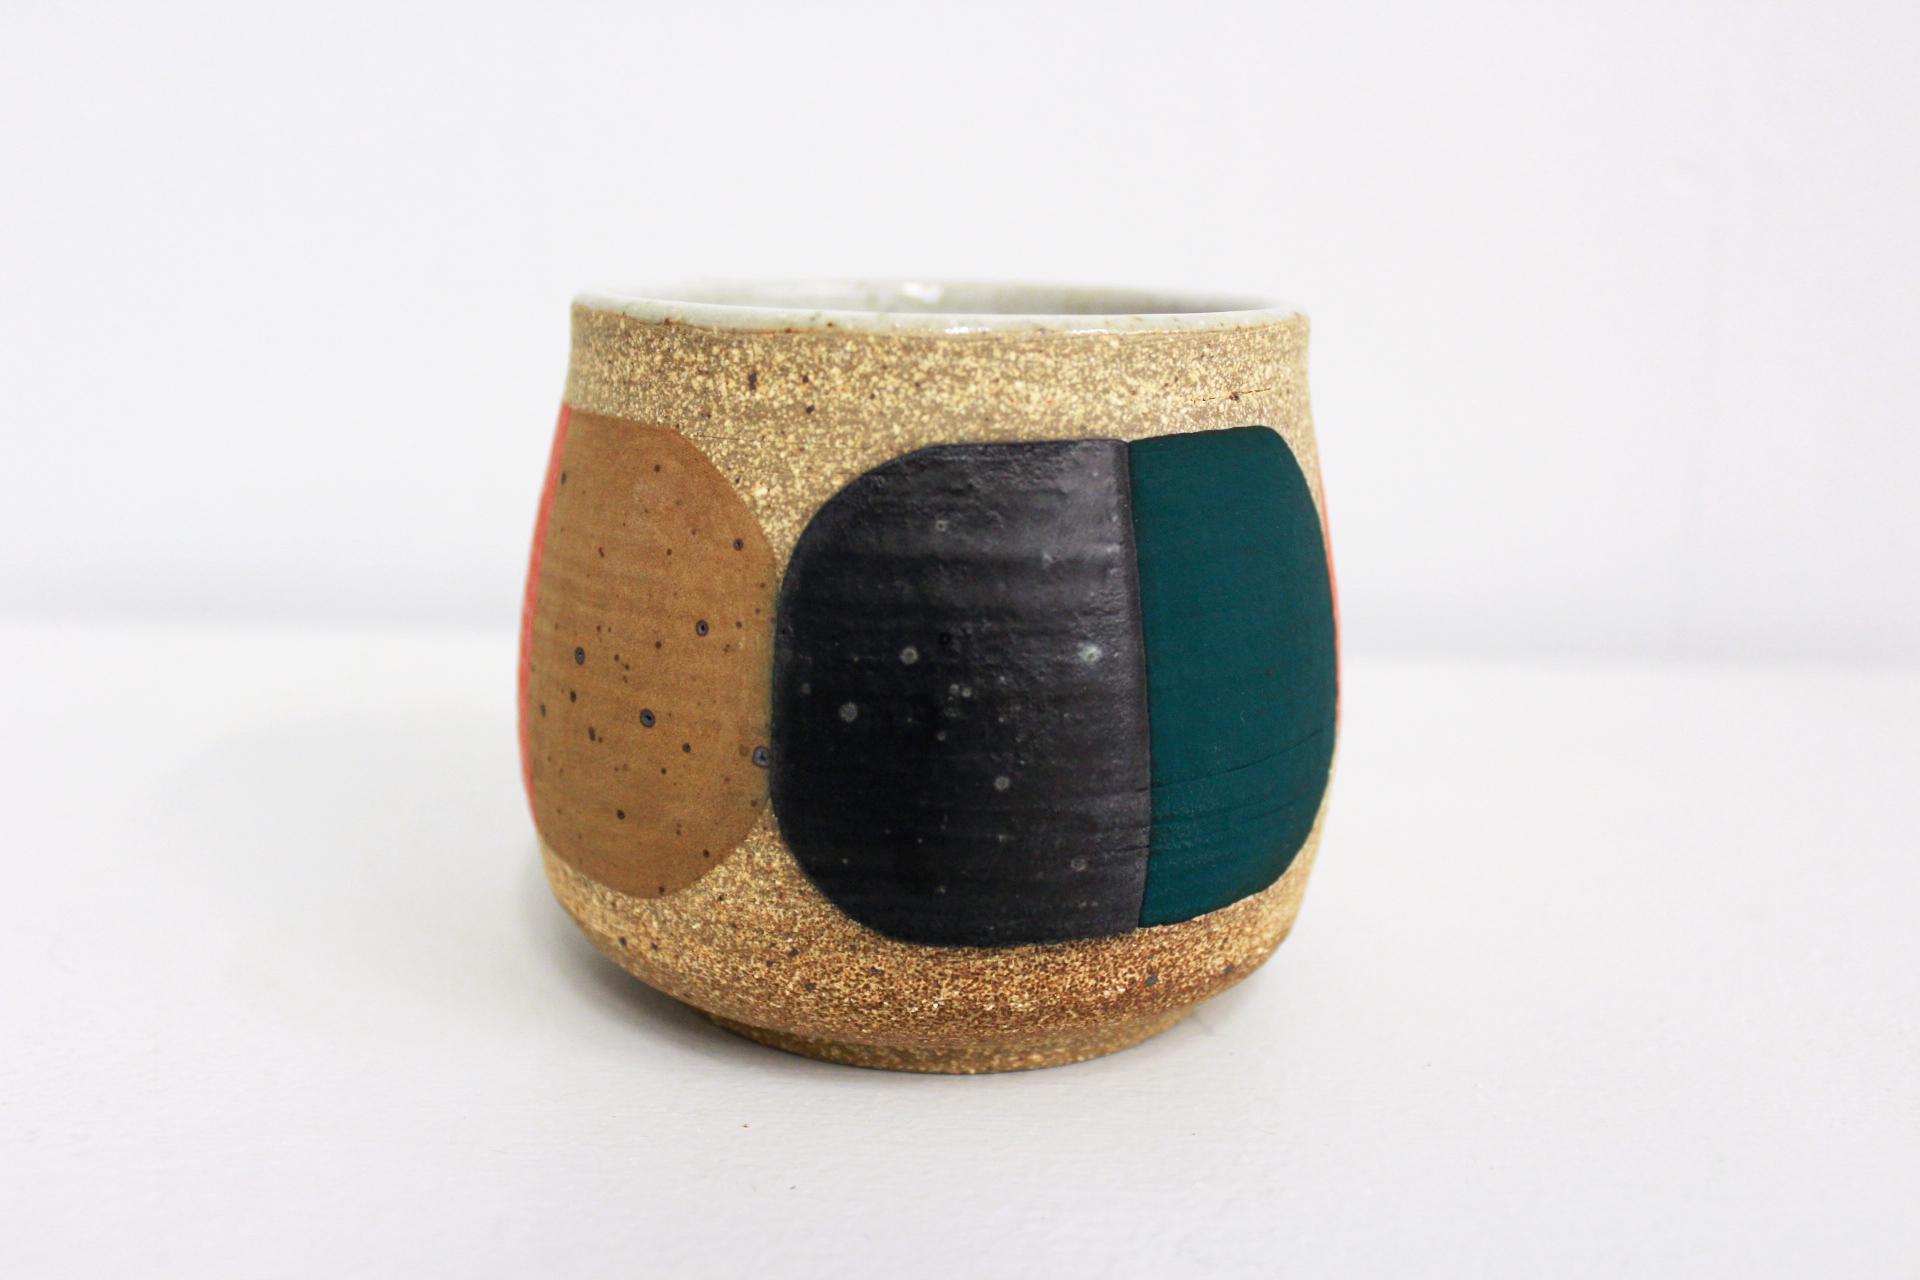 fall_2018_adv-ceramics_0031a.JPG